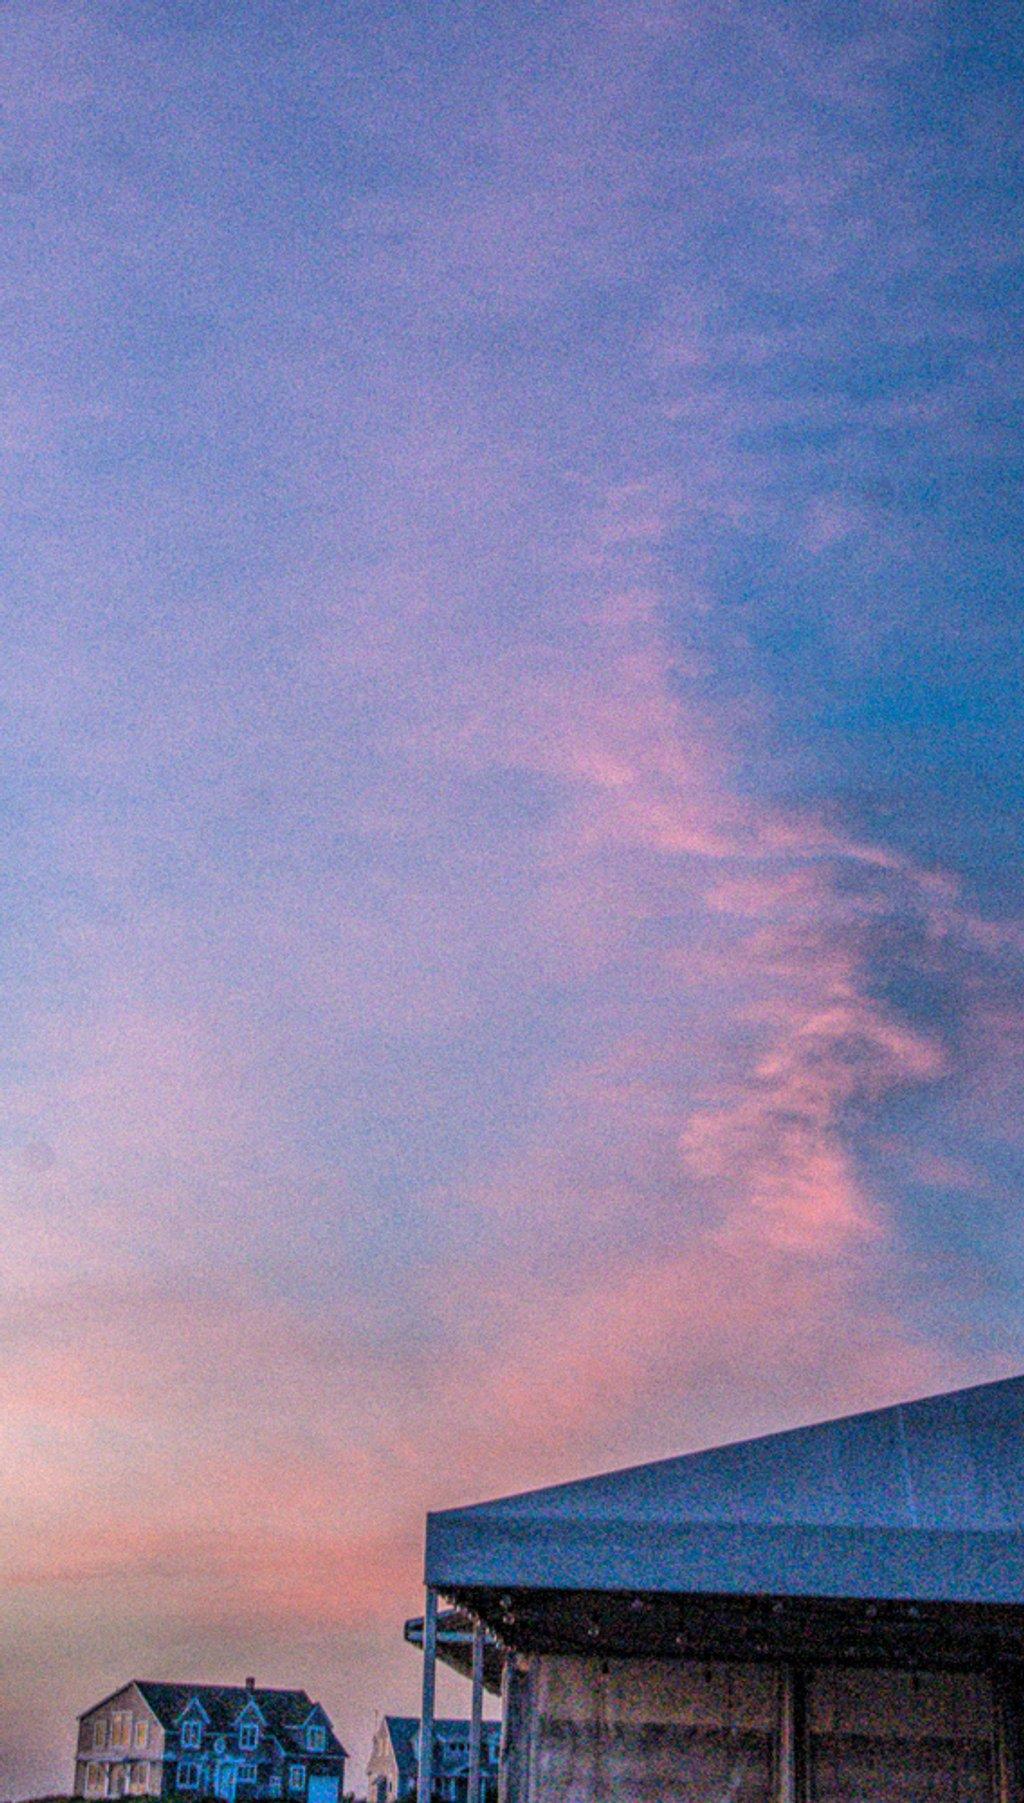 Pink Clouds by joansmor